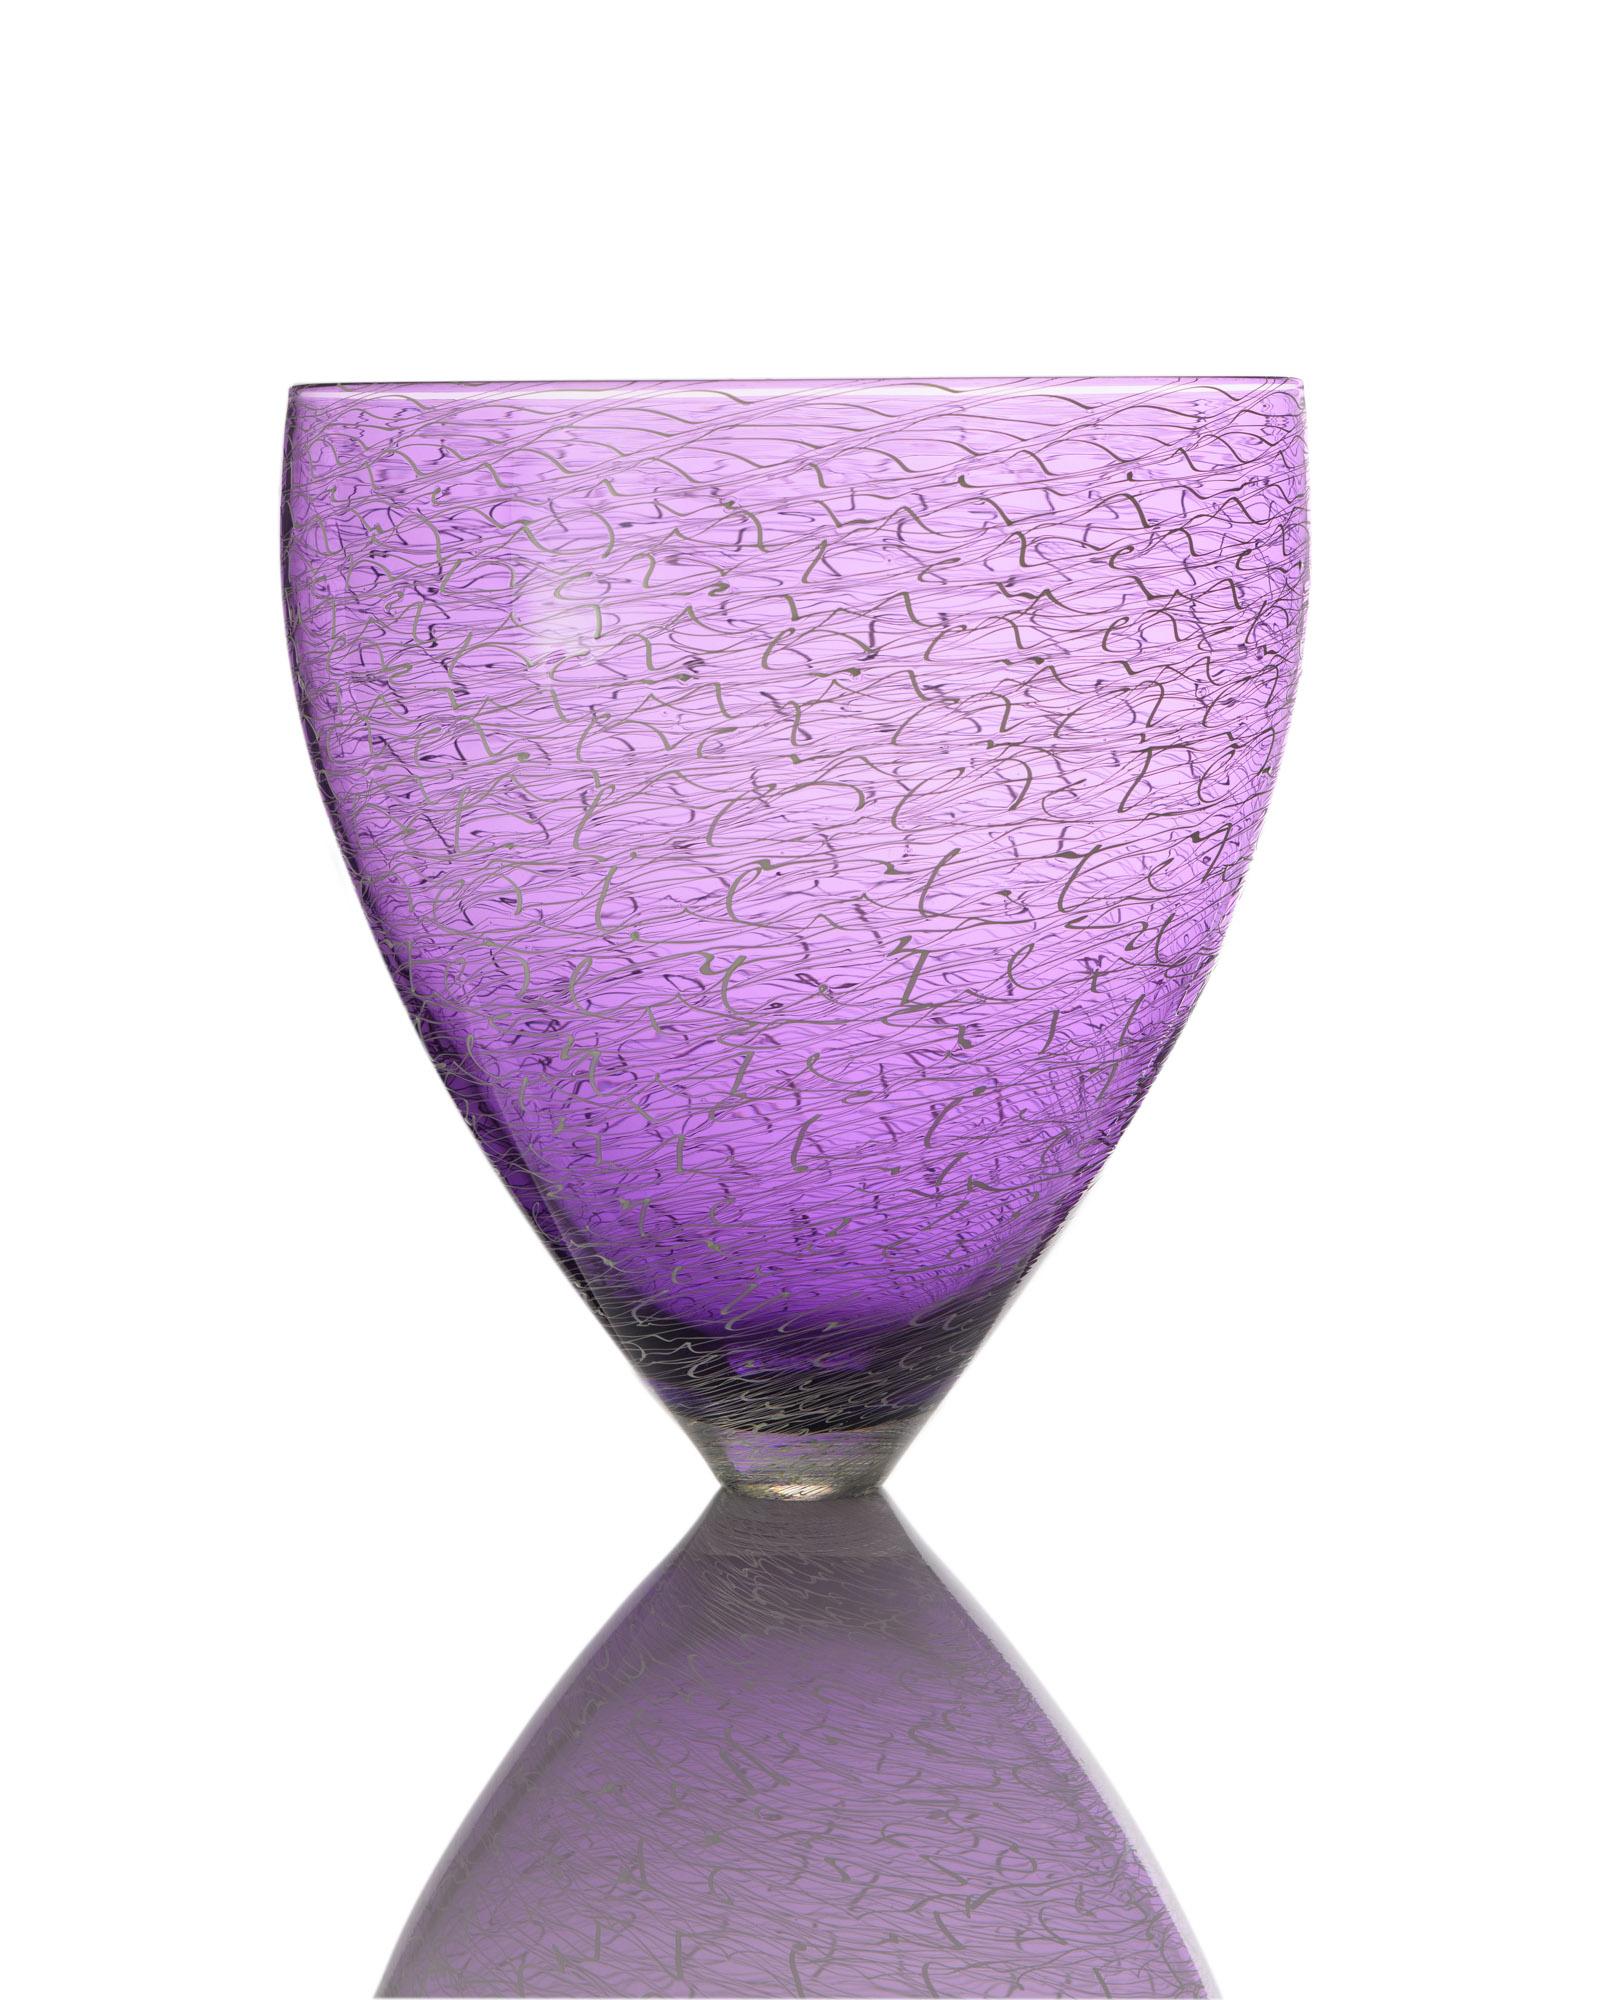 Marea Large Bowl - Hyacinth Purple_Seafoam